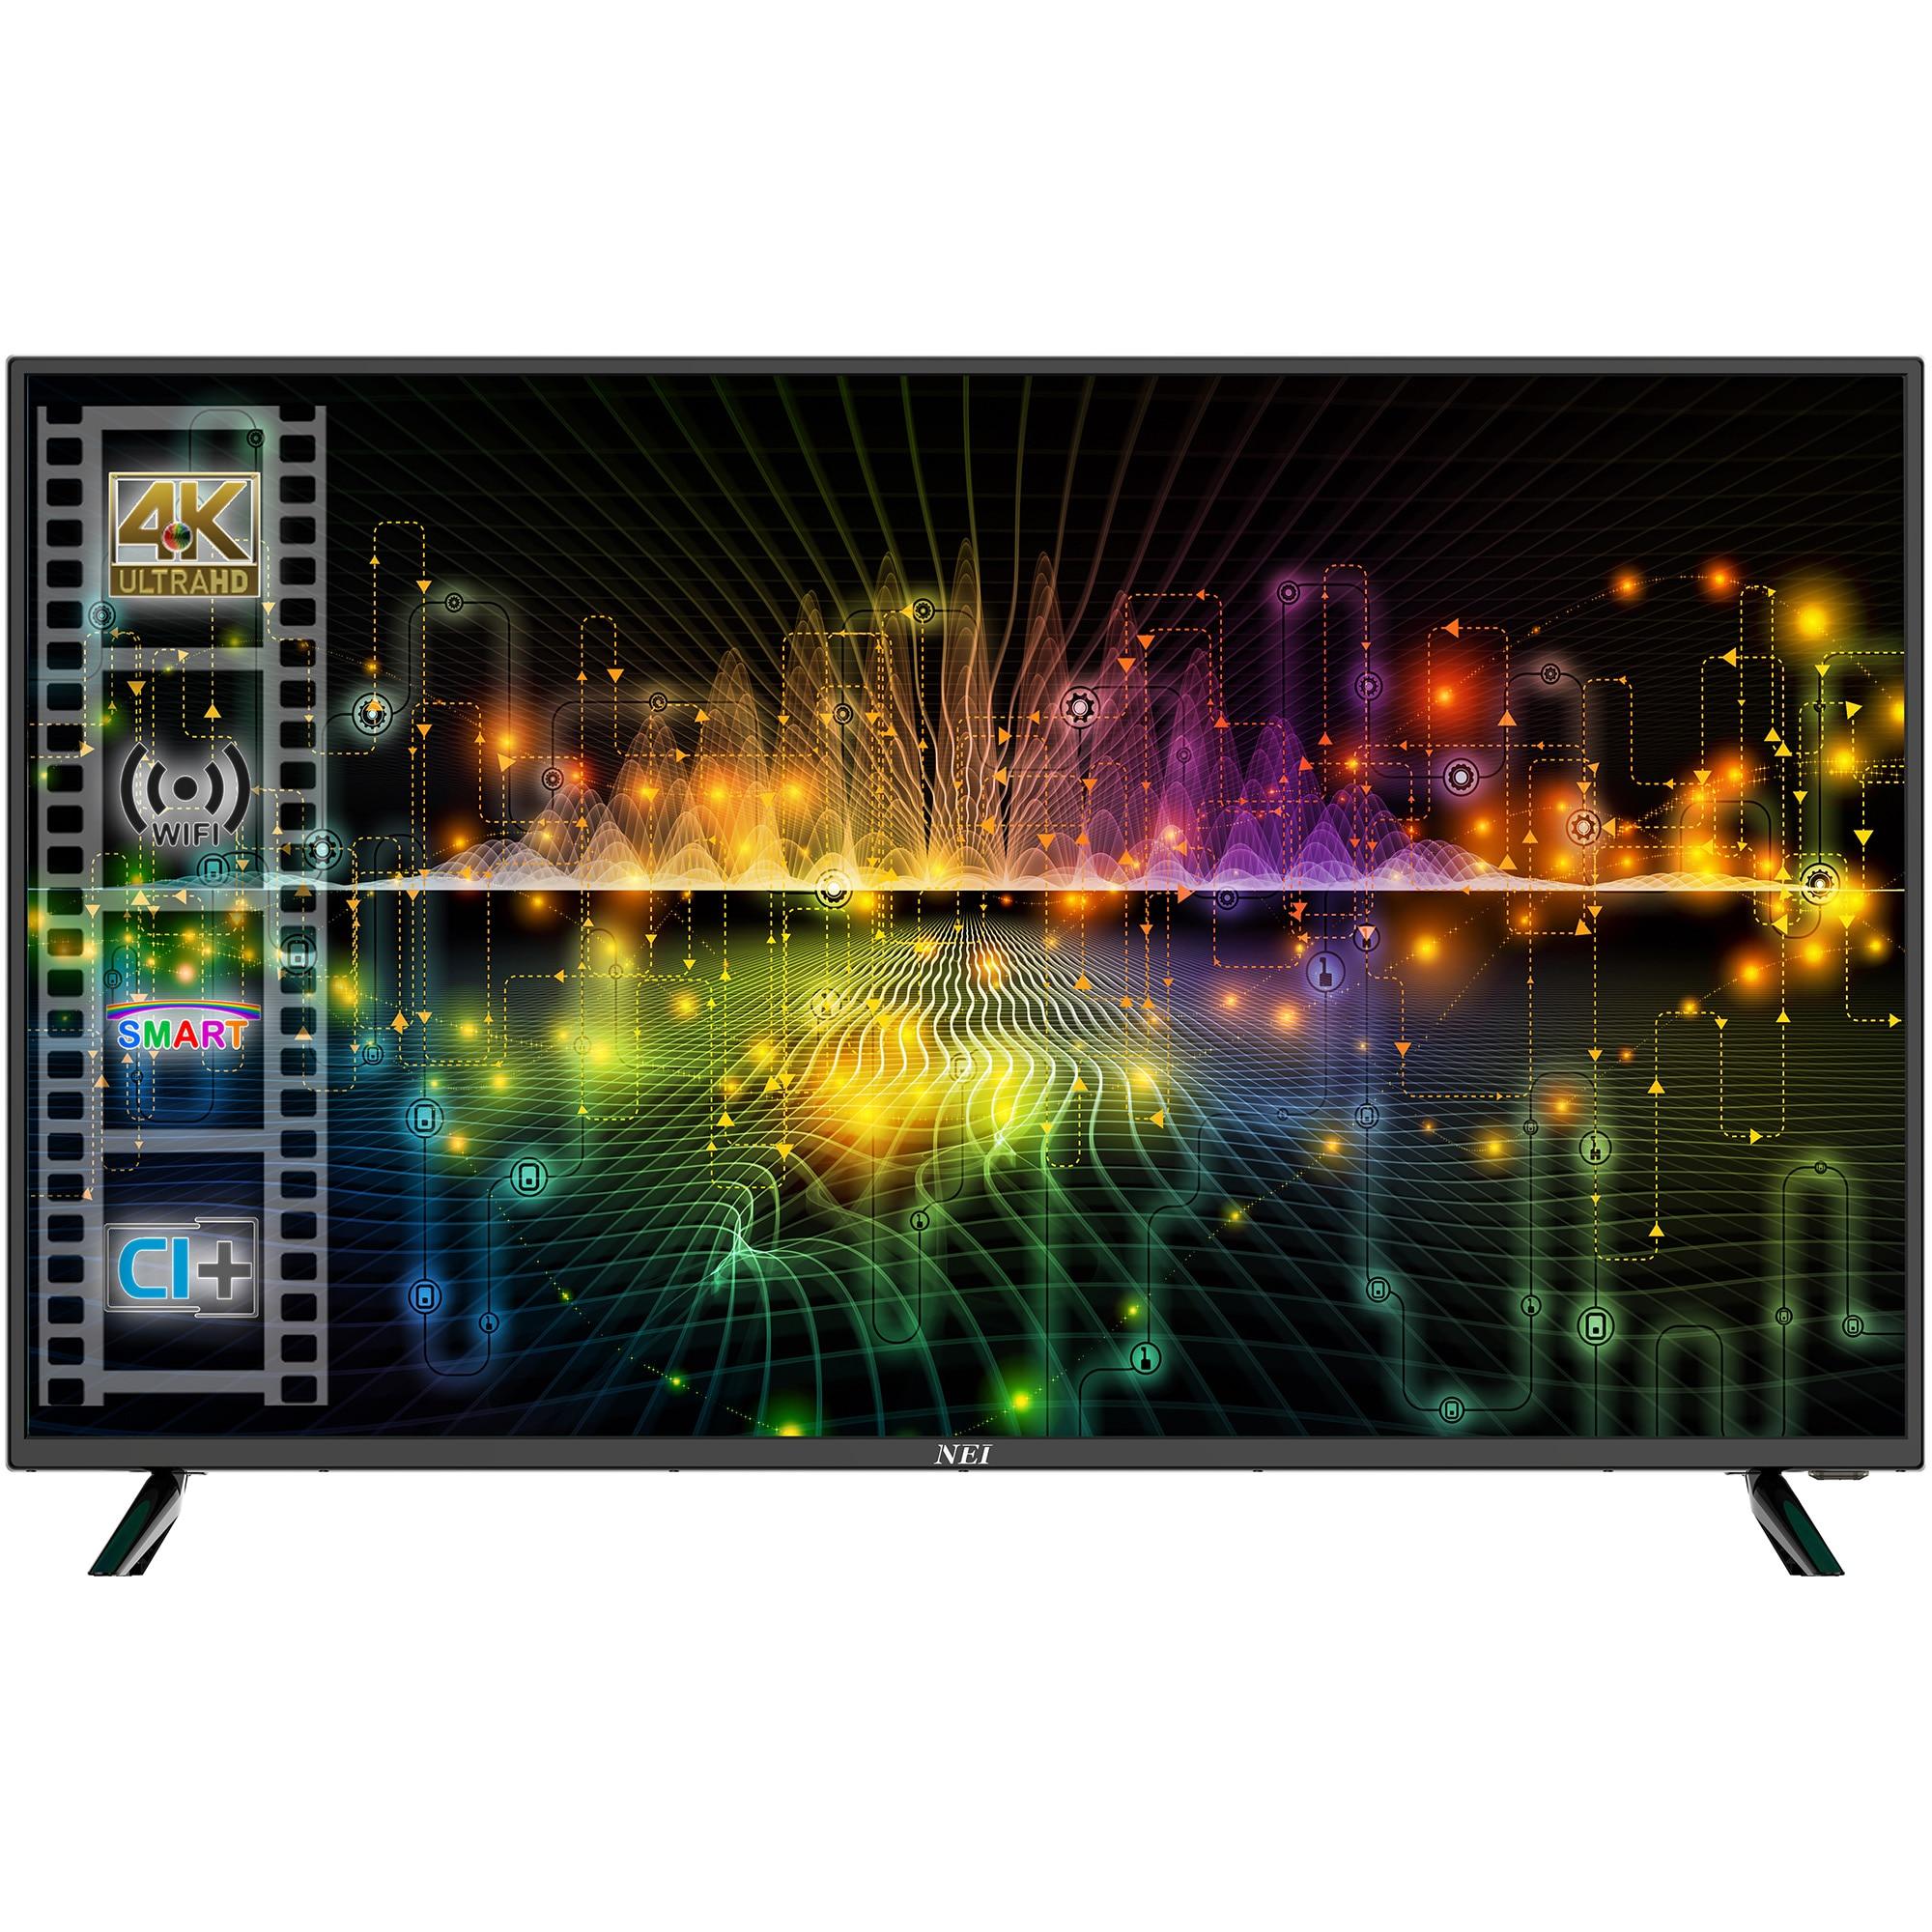 Fotografie Televizor Nei 50NE6700, 126cm, Smart, 4K Ultra HD, LED